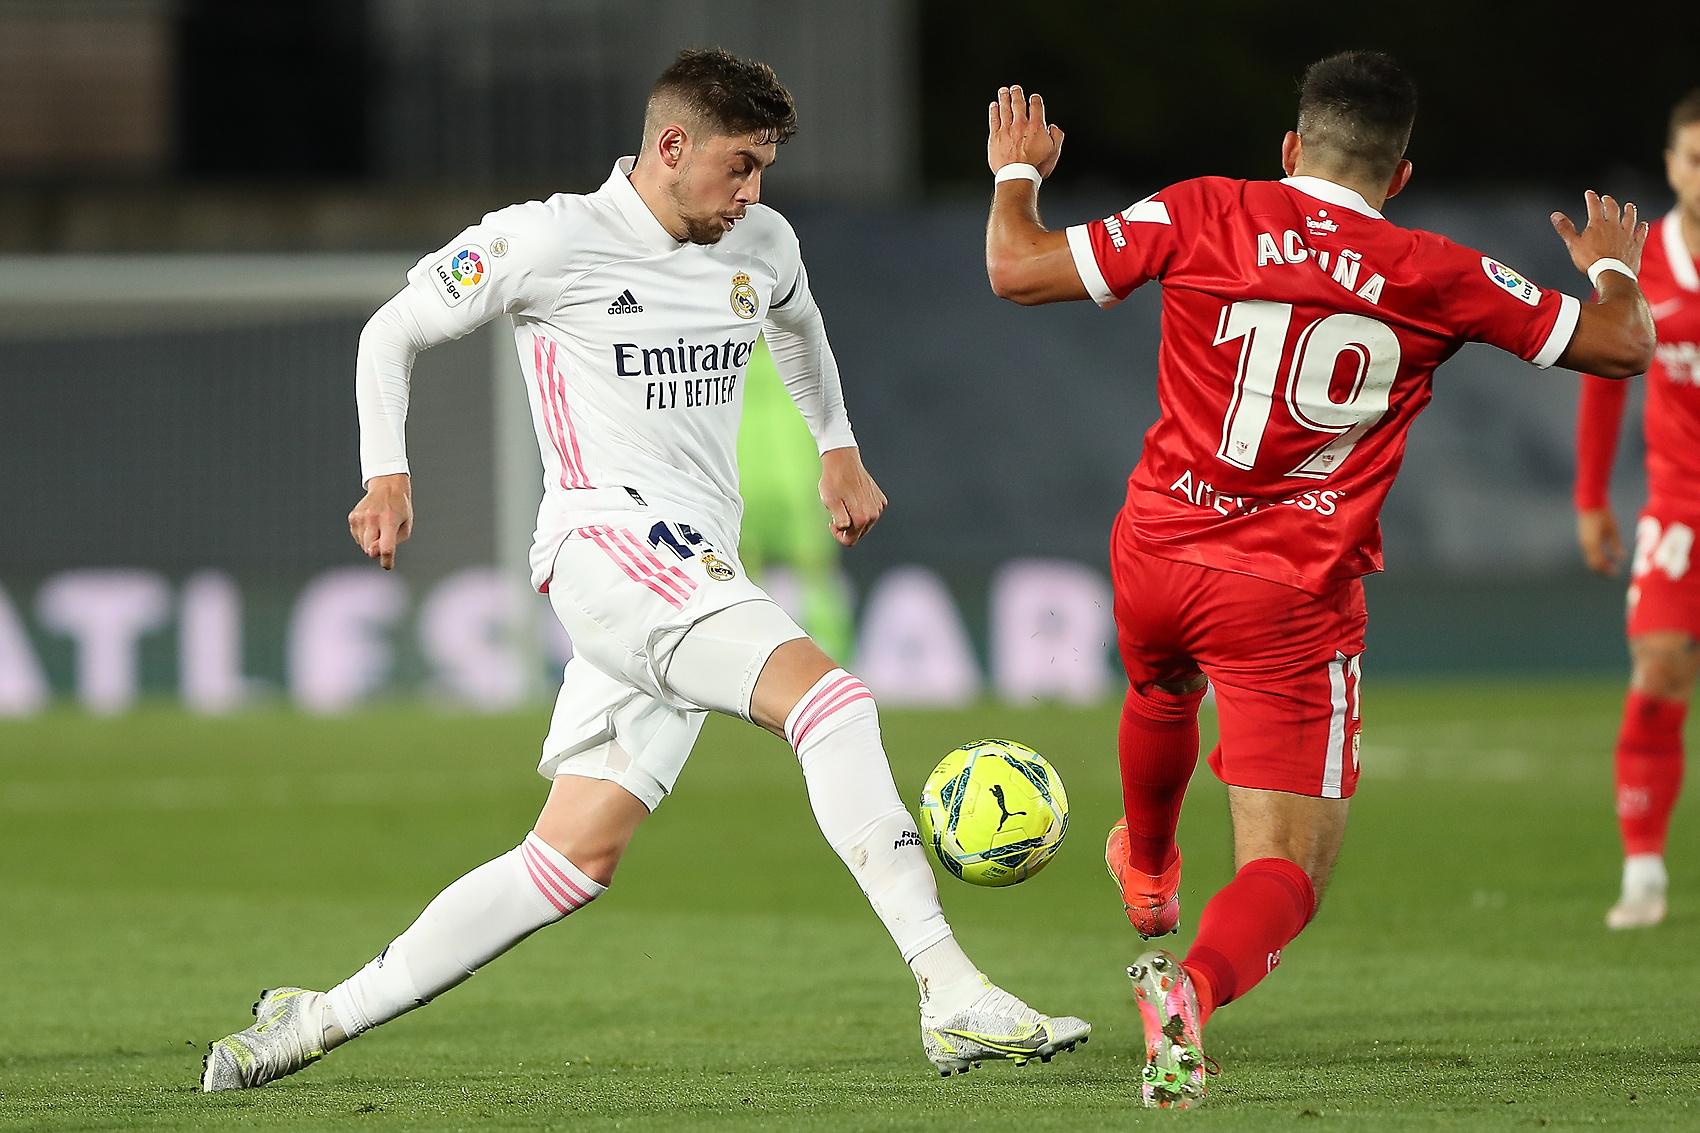 Valverde Madrid